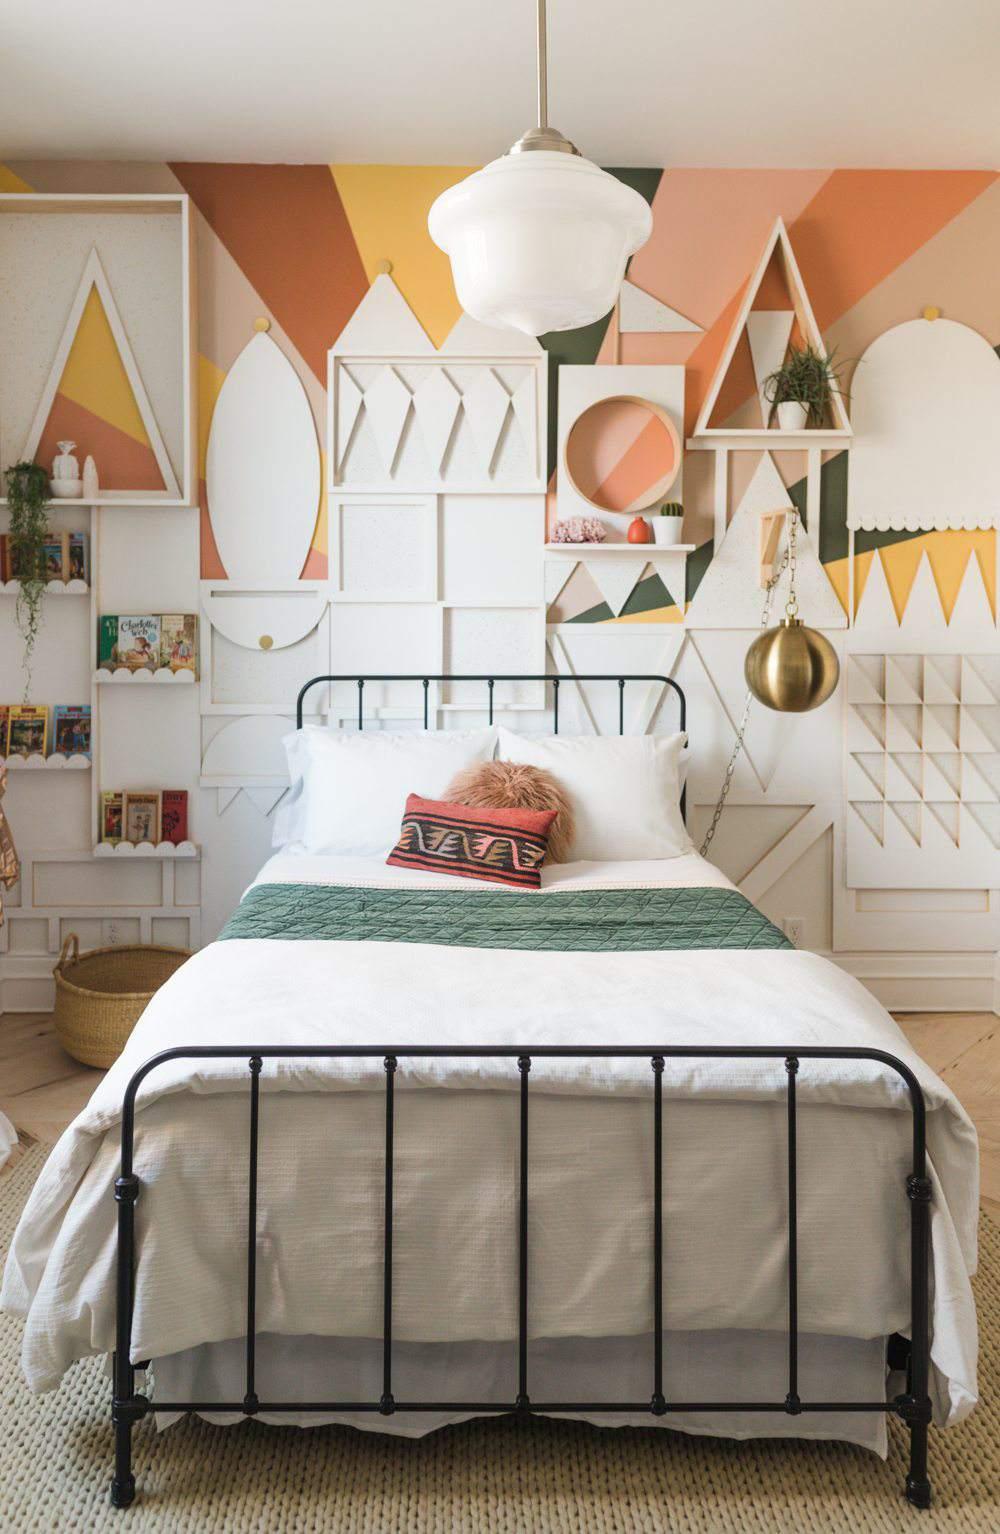 Budget bedroom decorating tips